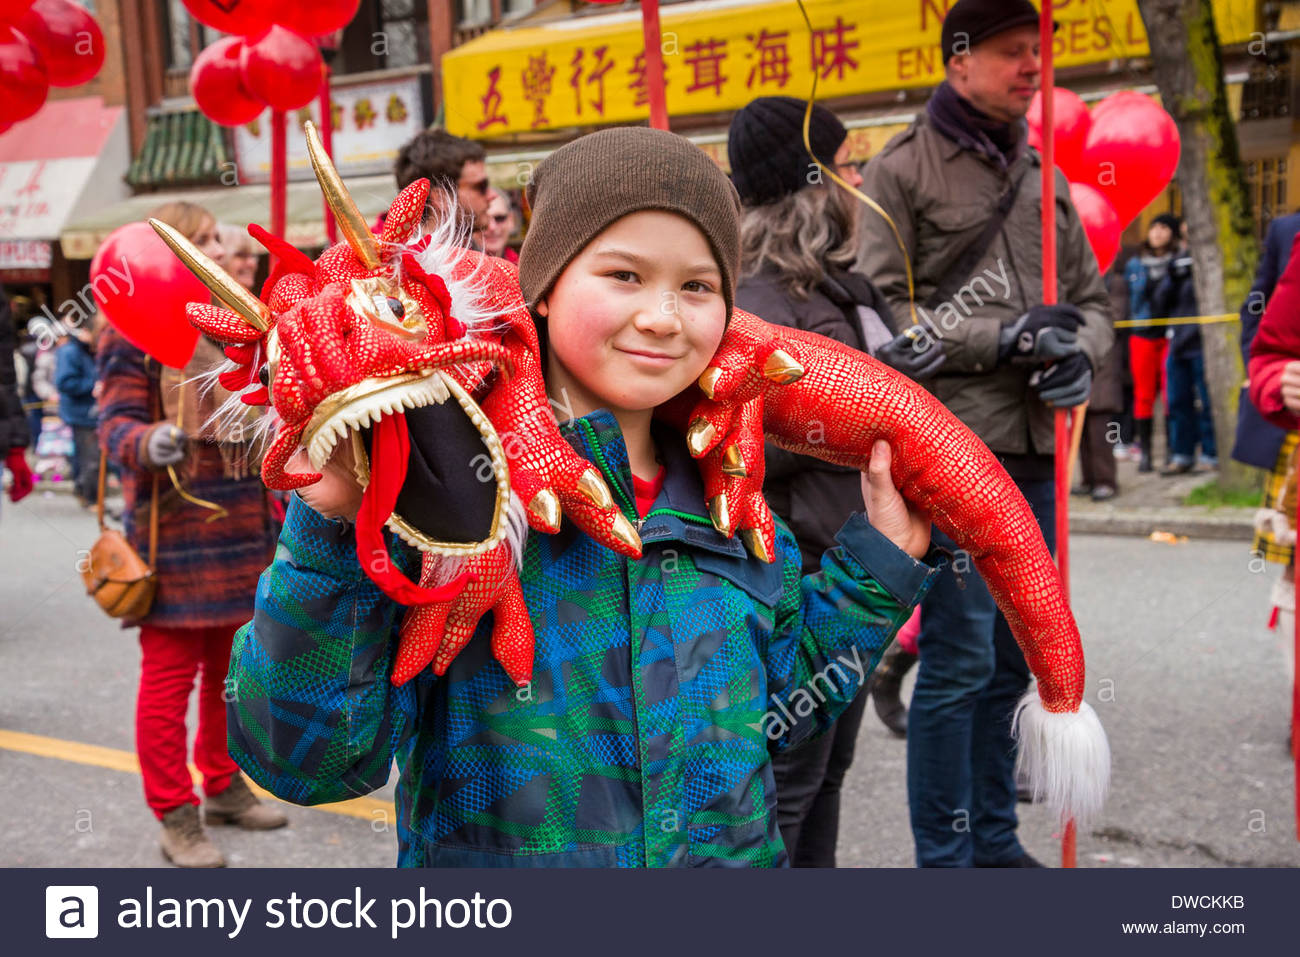 Garçon avec toy dragon, Nouvel An chinois défilé, Vancouver, British Columbia, Canada Photo Stock